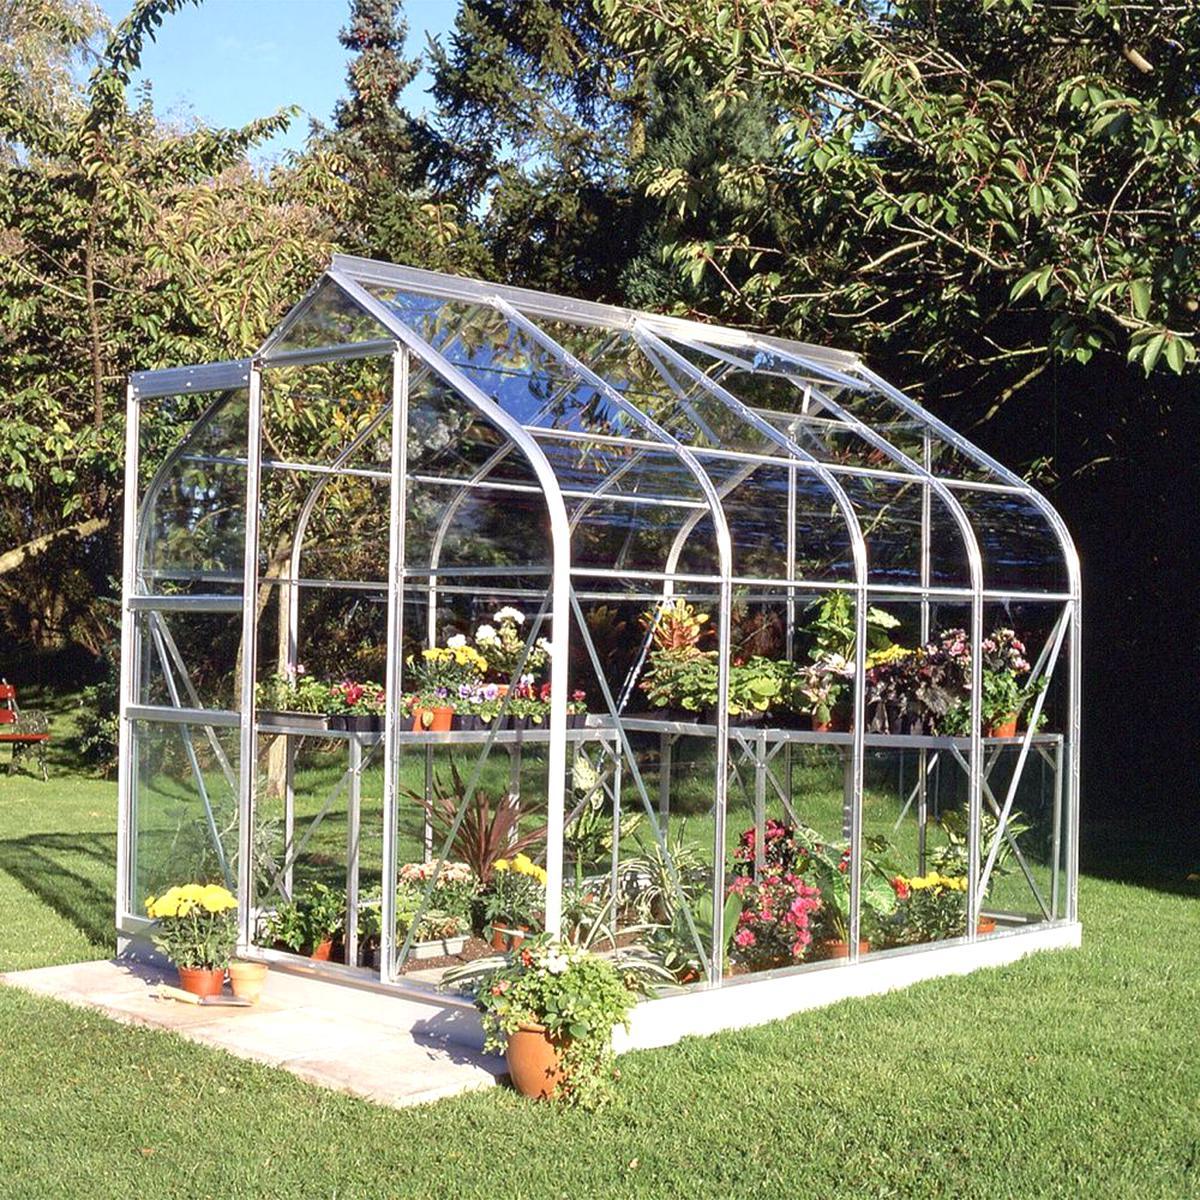 Serre Horticole Verre D'occasion destiné Serres De Jardin D Occasion